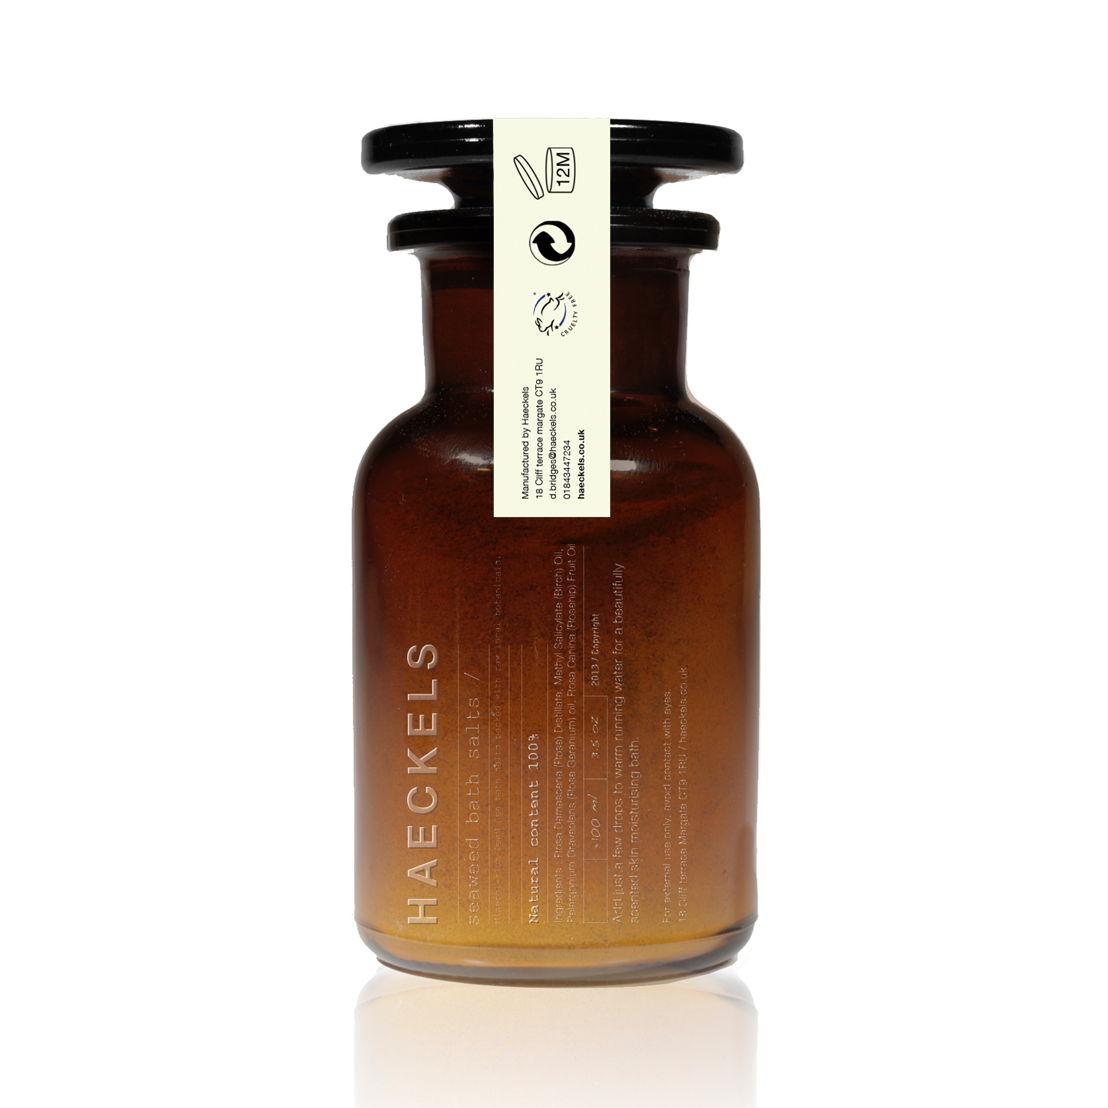 Seaweed / Walnut Facial Exfoliant